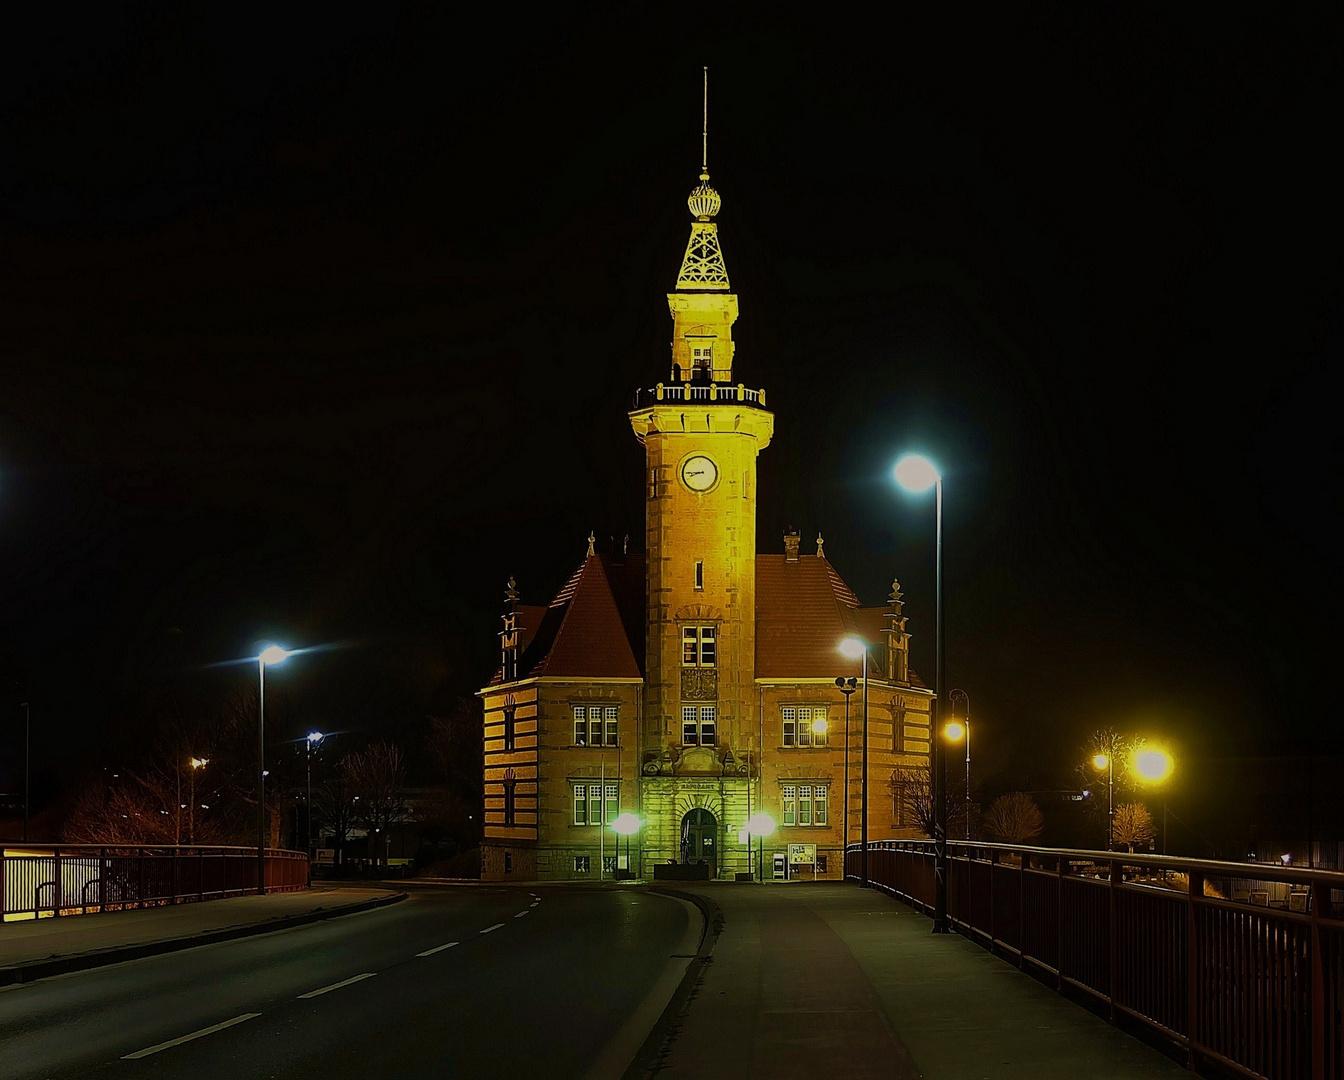 Altes Hafenamt in Dortmund